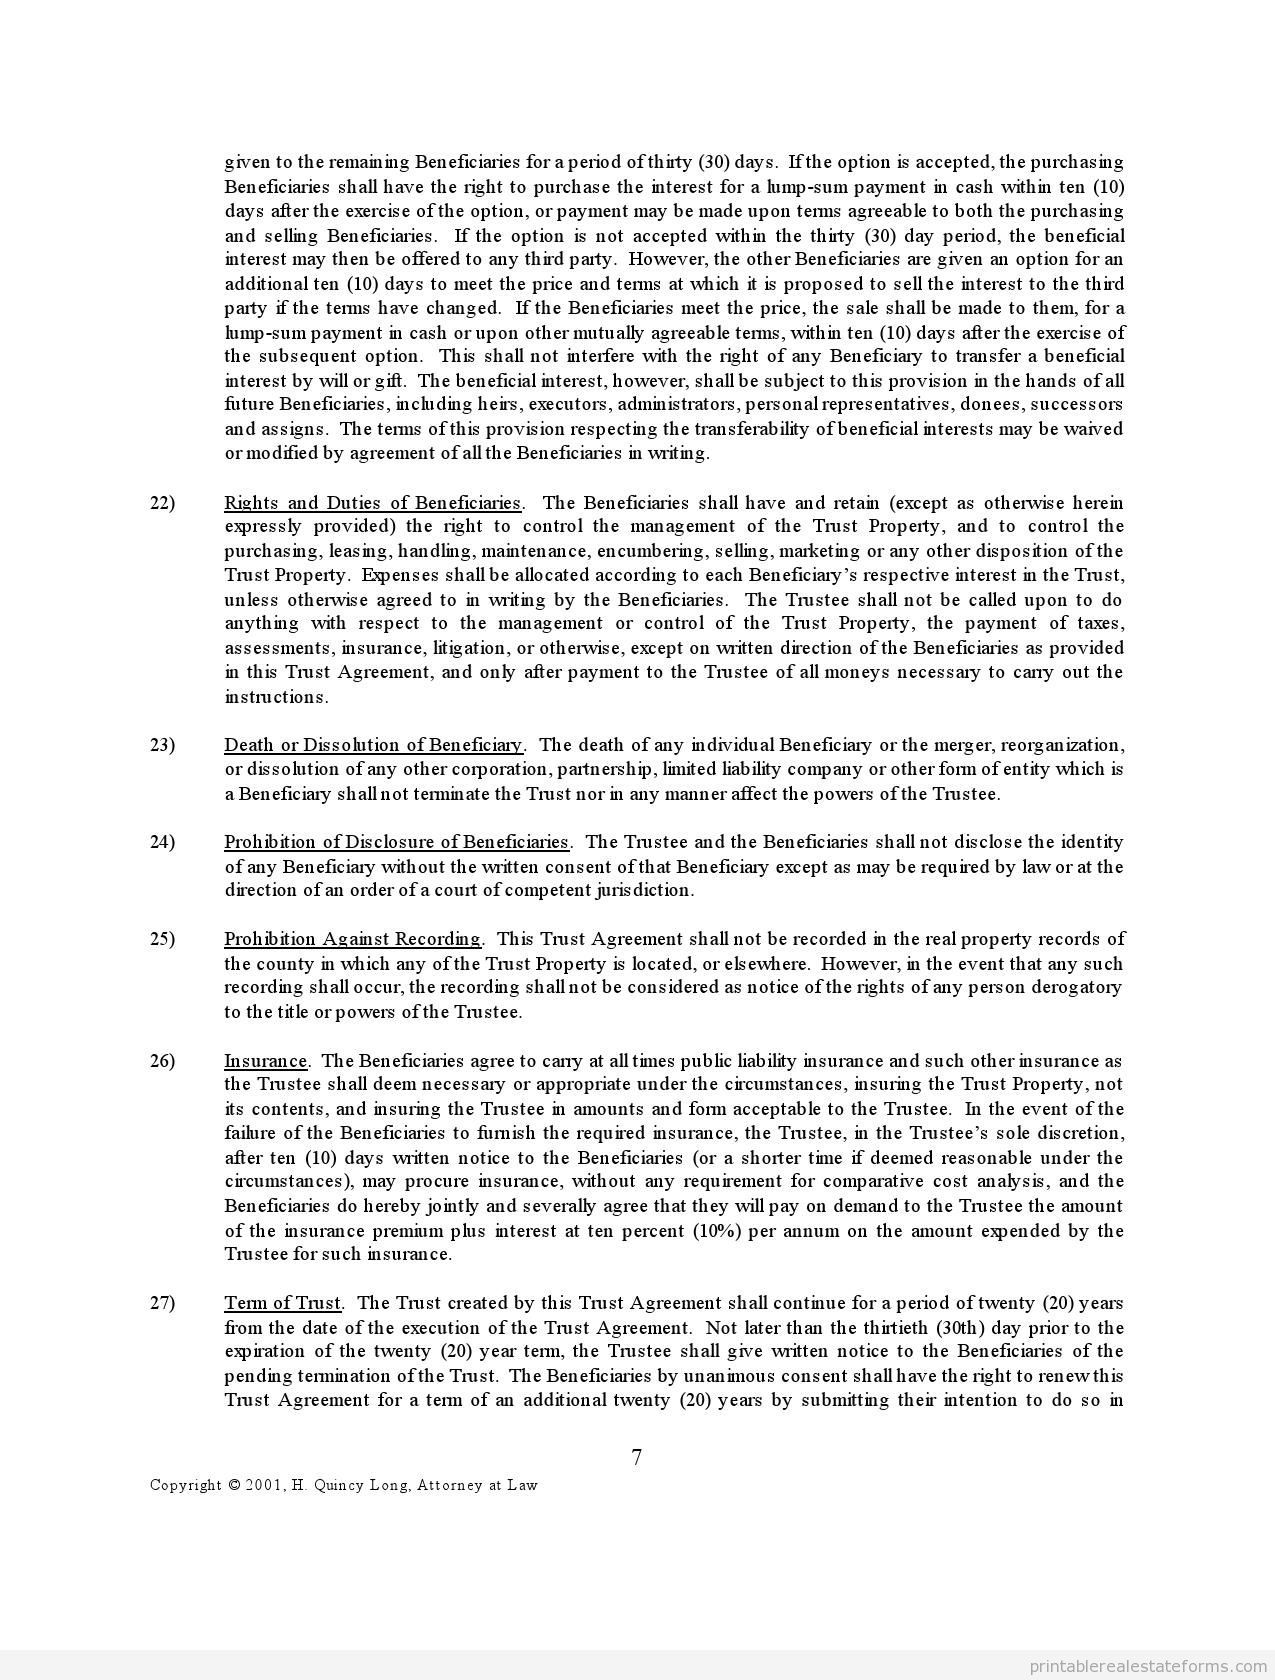 Free Trustagreement Form Printable Real Estate Forms Legal Forms Real Estate Forms Real Estate Templates